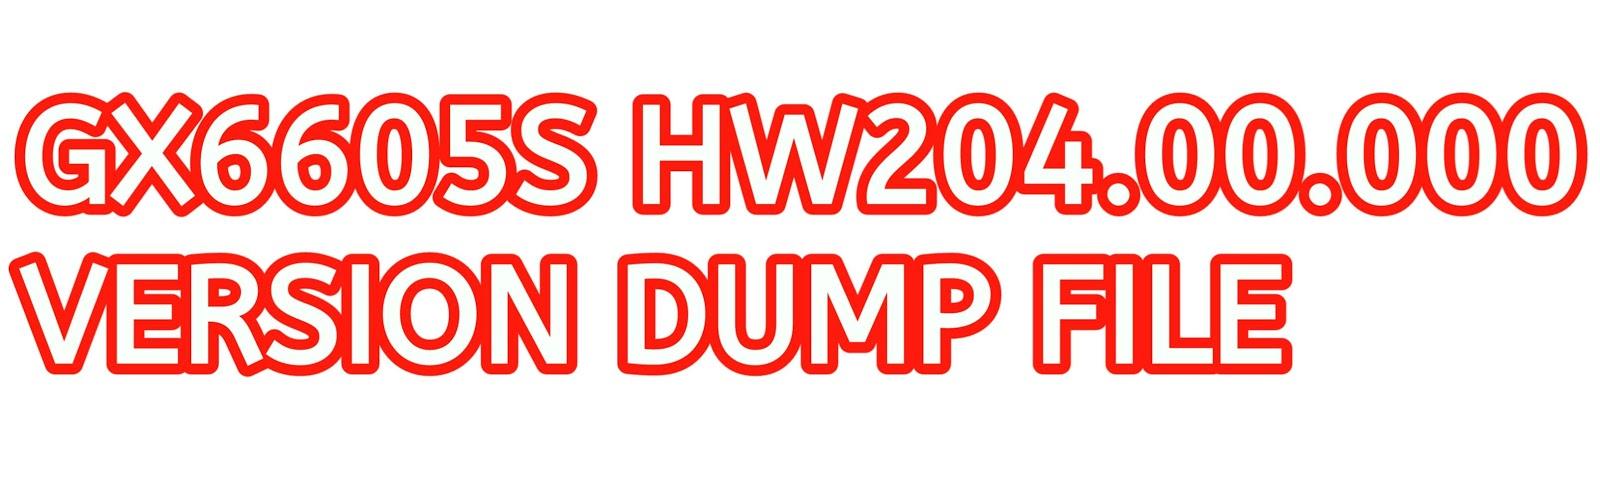 GX6605S HW204.00.000 VERSION DUMP FILE